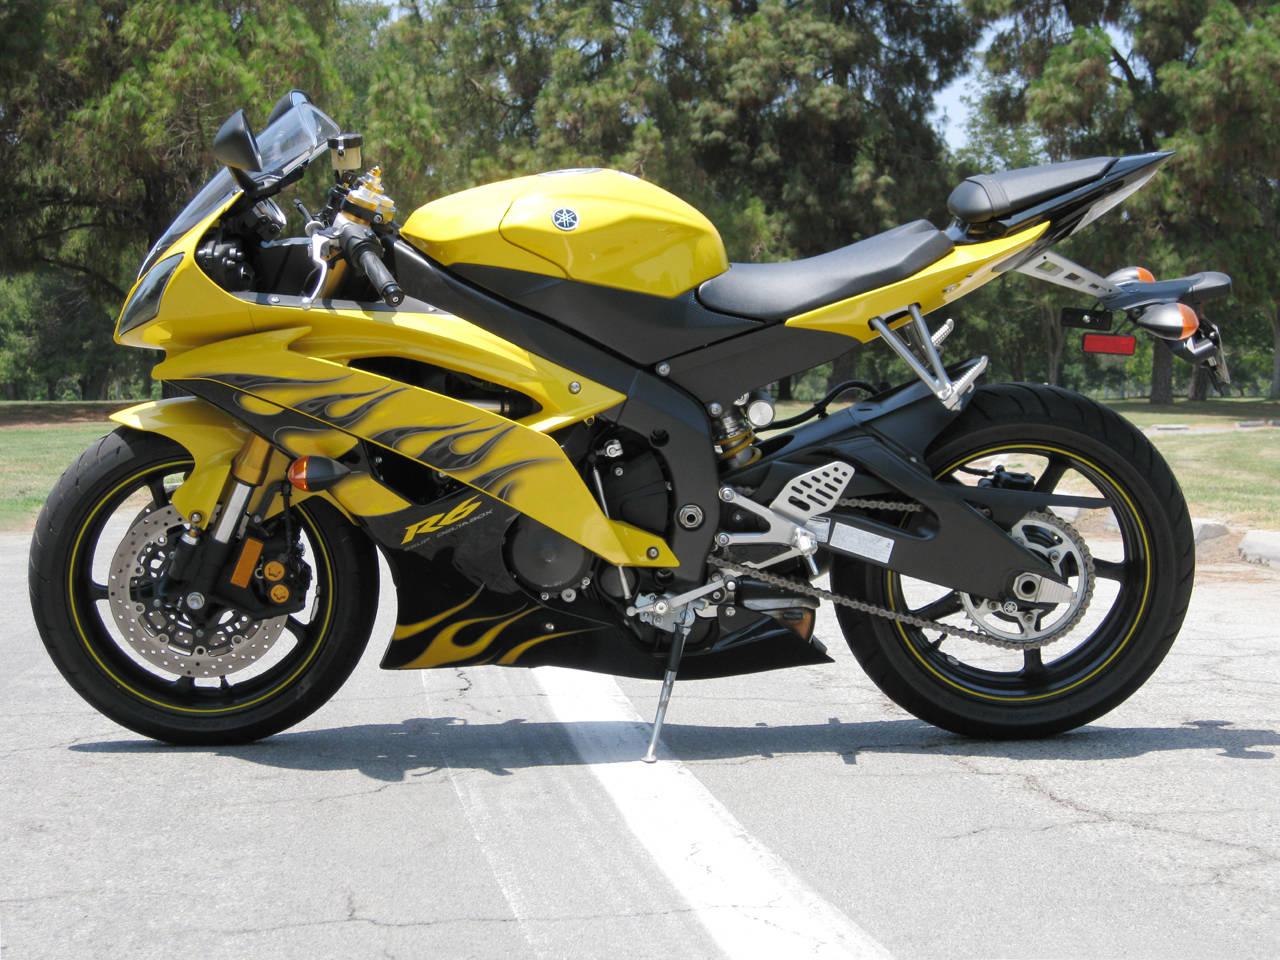 Price Of: Yamaha R6 Price Of India